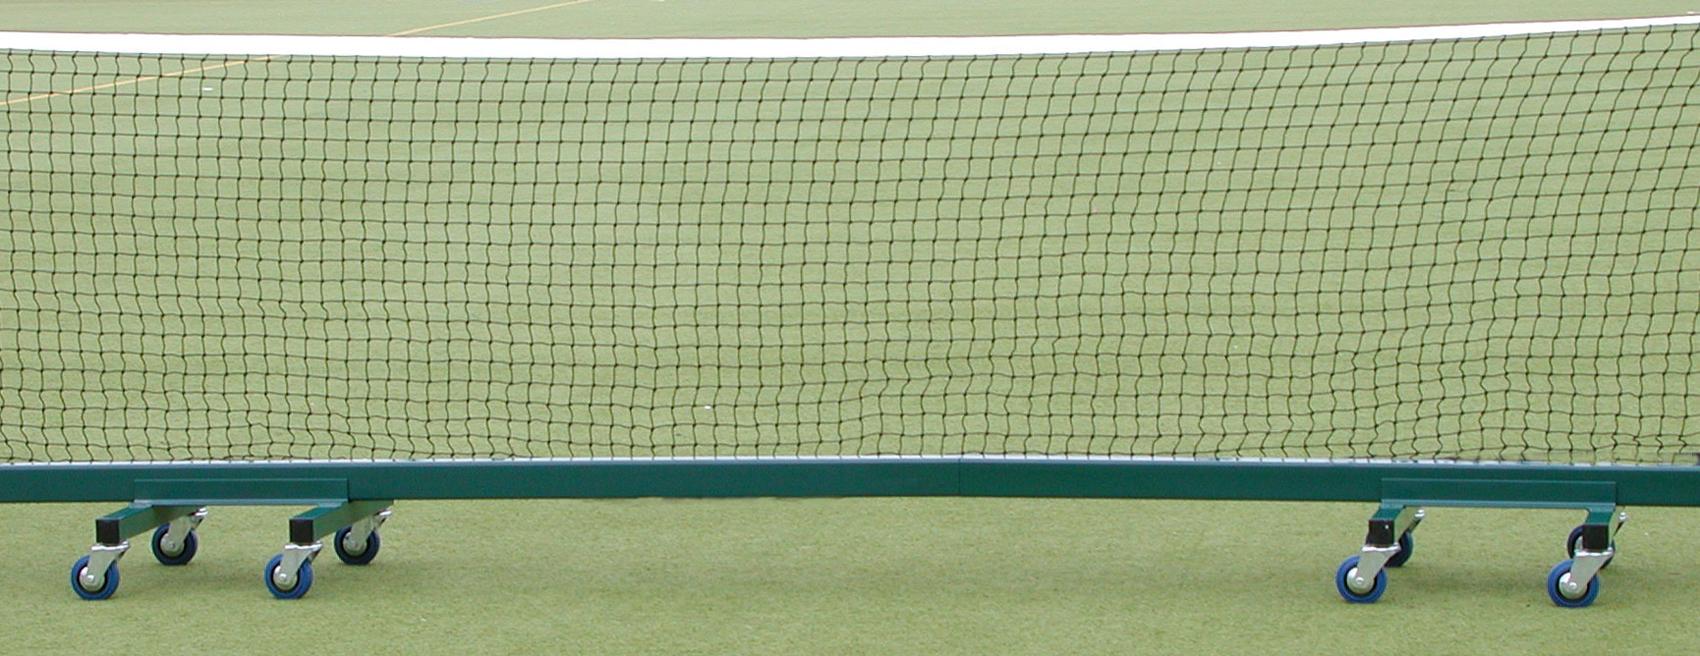 Tournament Freestanding Tennis Post Trolley